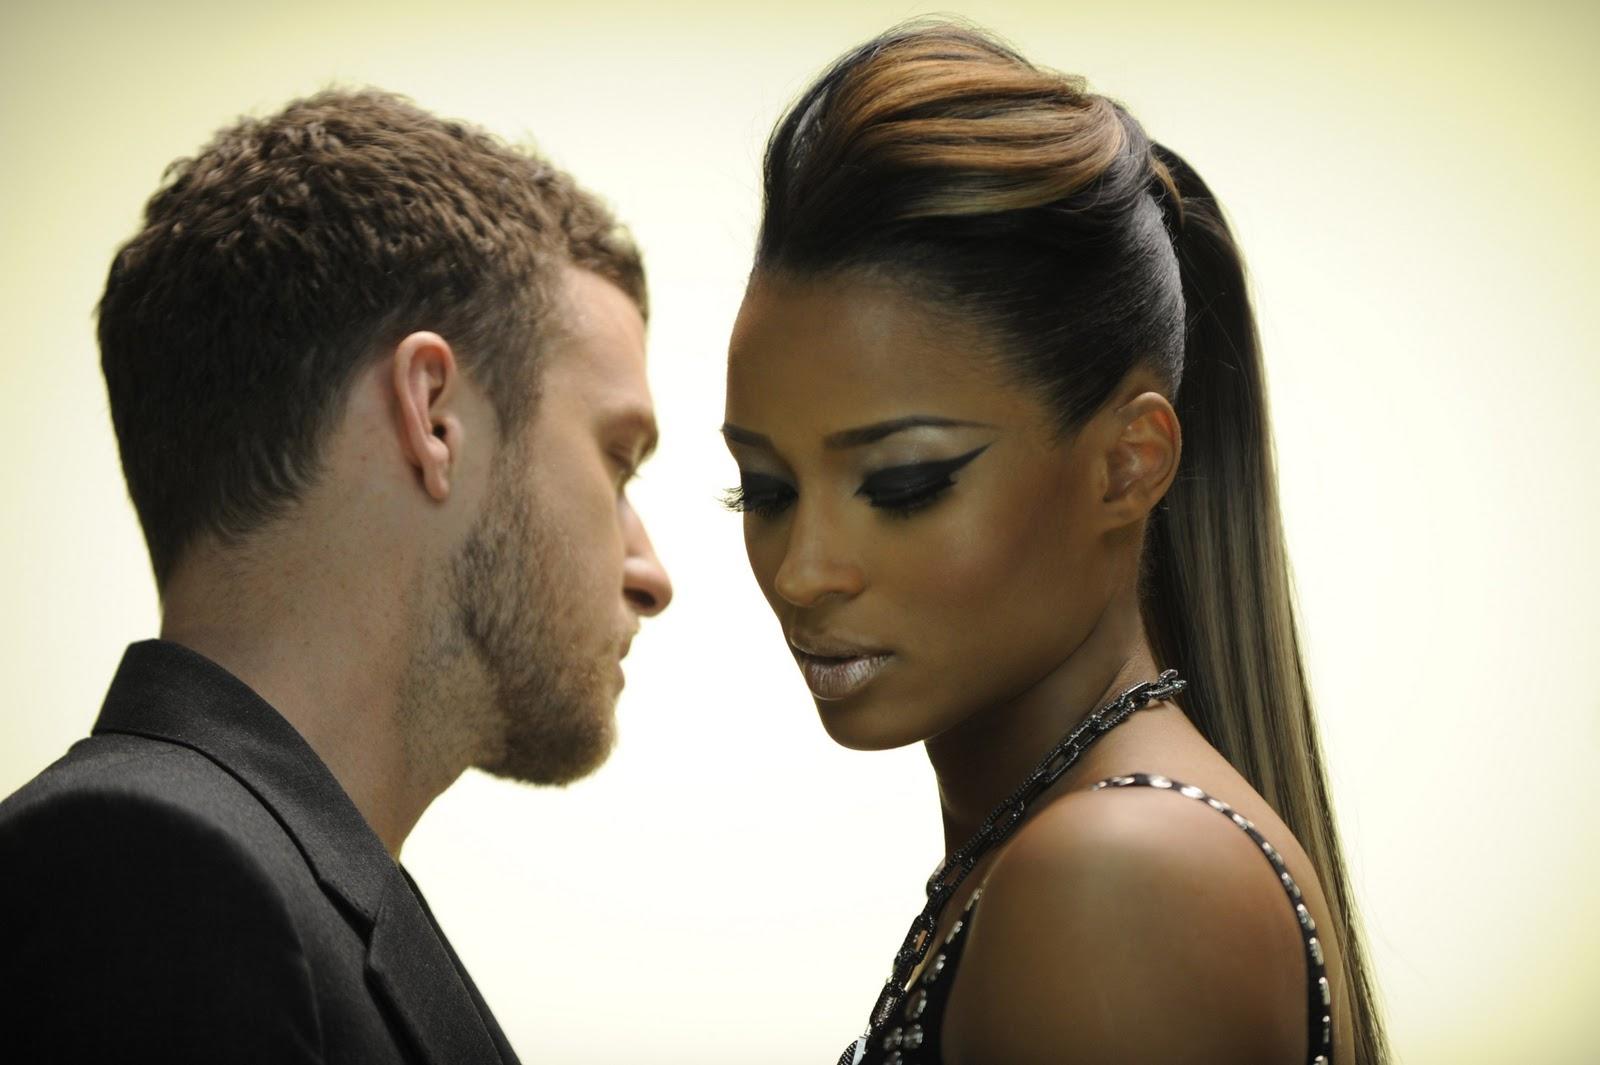 http://3.bp.blogspot.com/-dRetZaEMX4A/Tsn2KkcdW3I/AAAAAAAAHKU/ENRN6ZzSr4U/s1600/Ciara-e-Justin-Timberlake.jpg